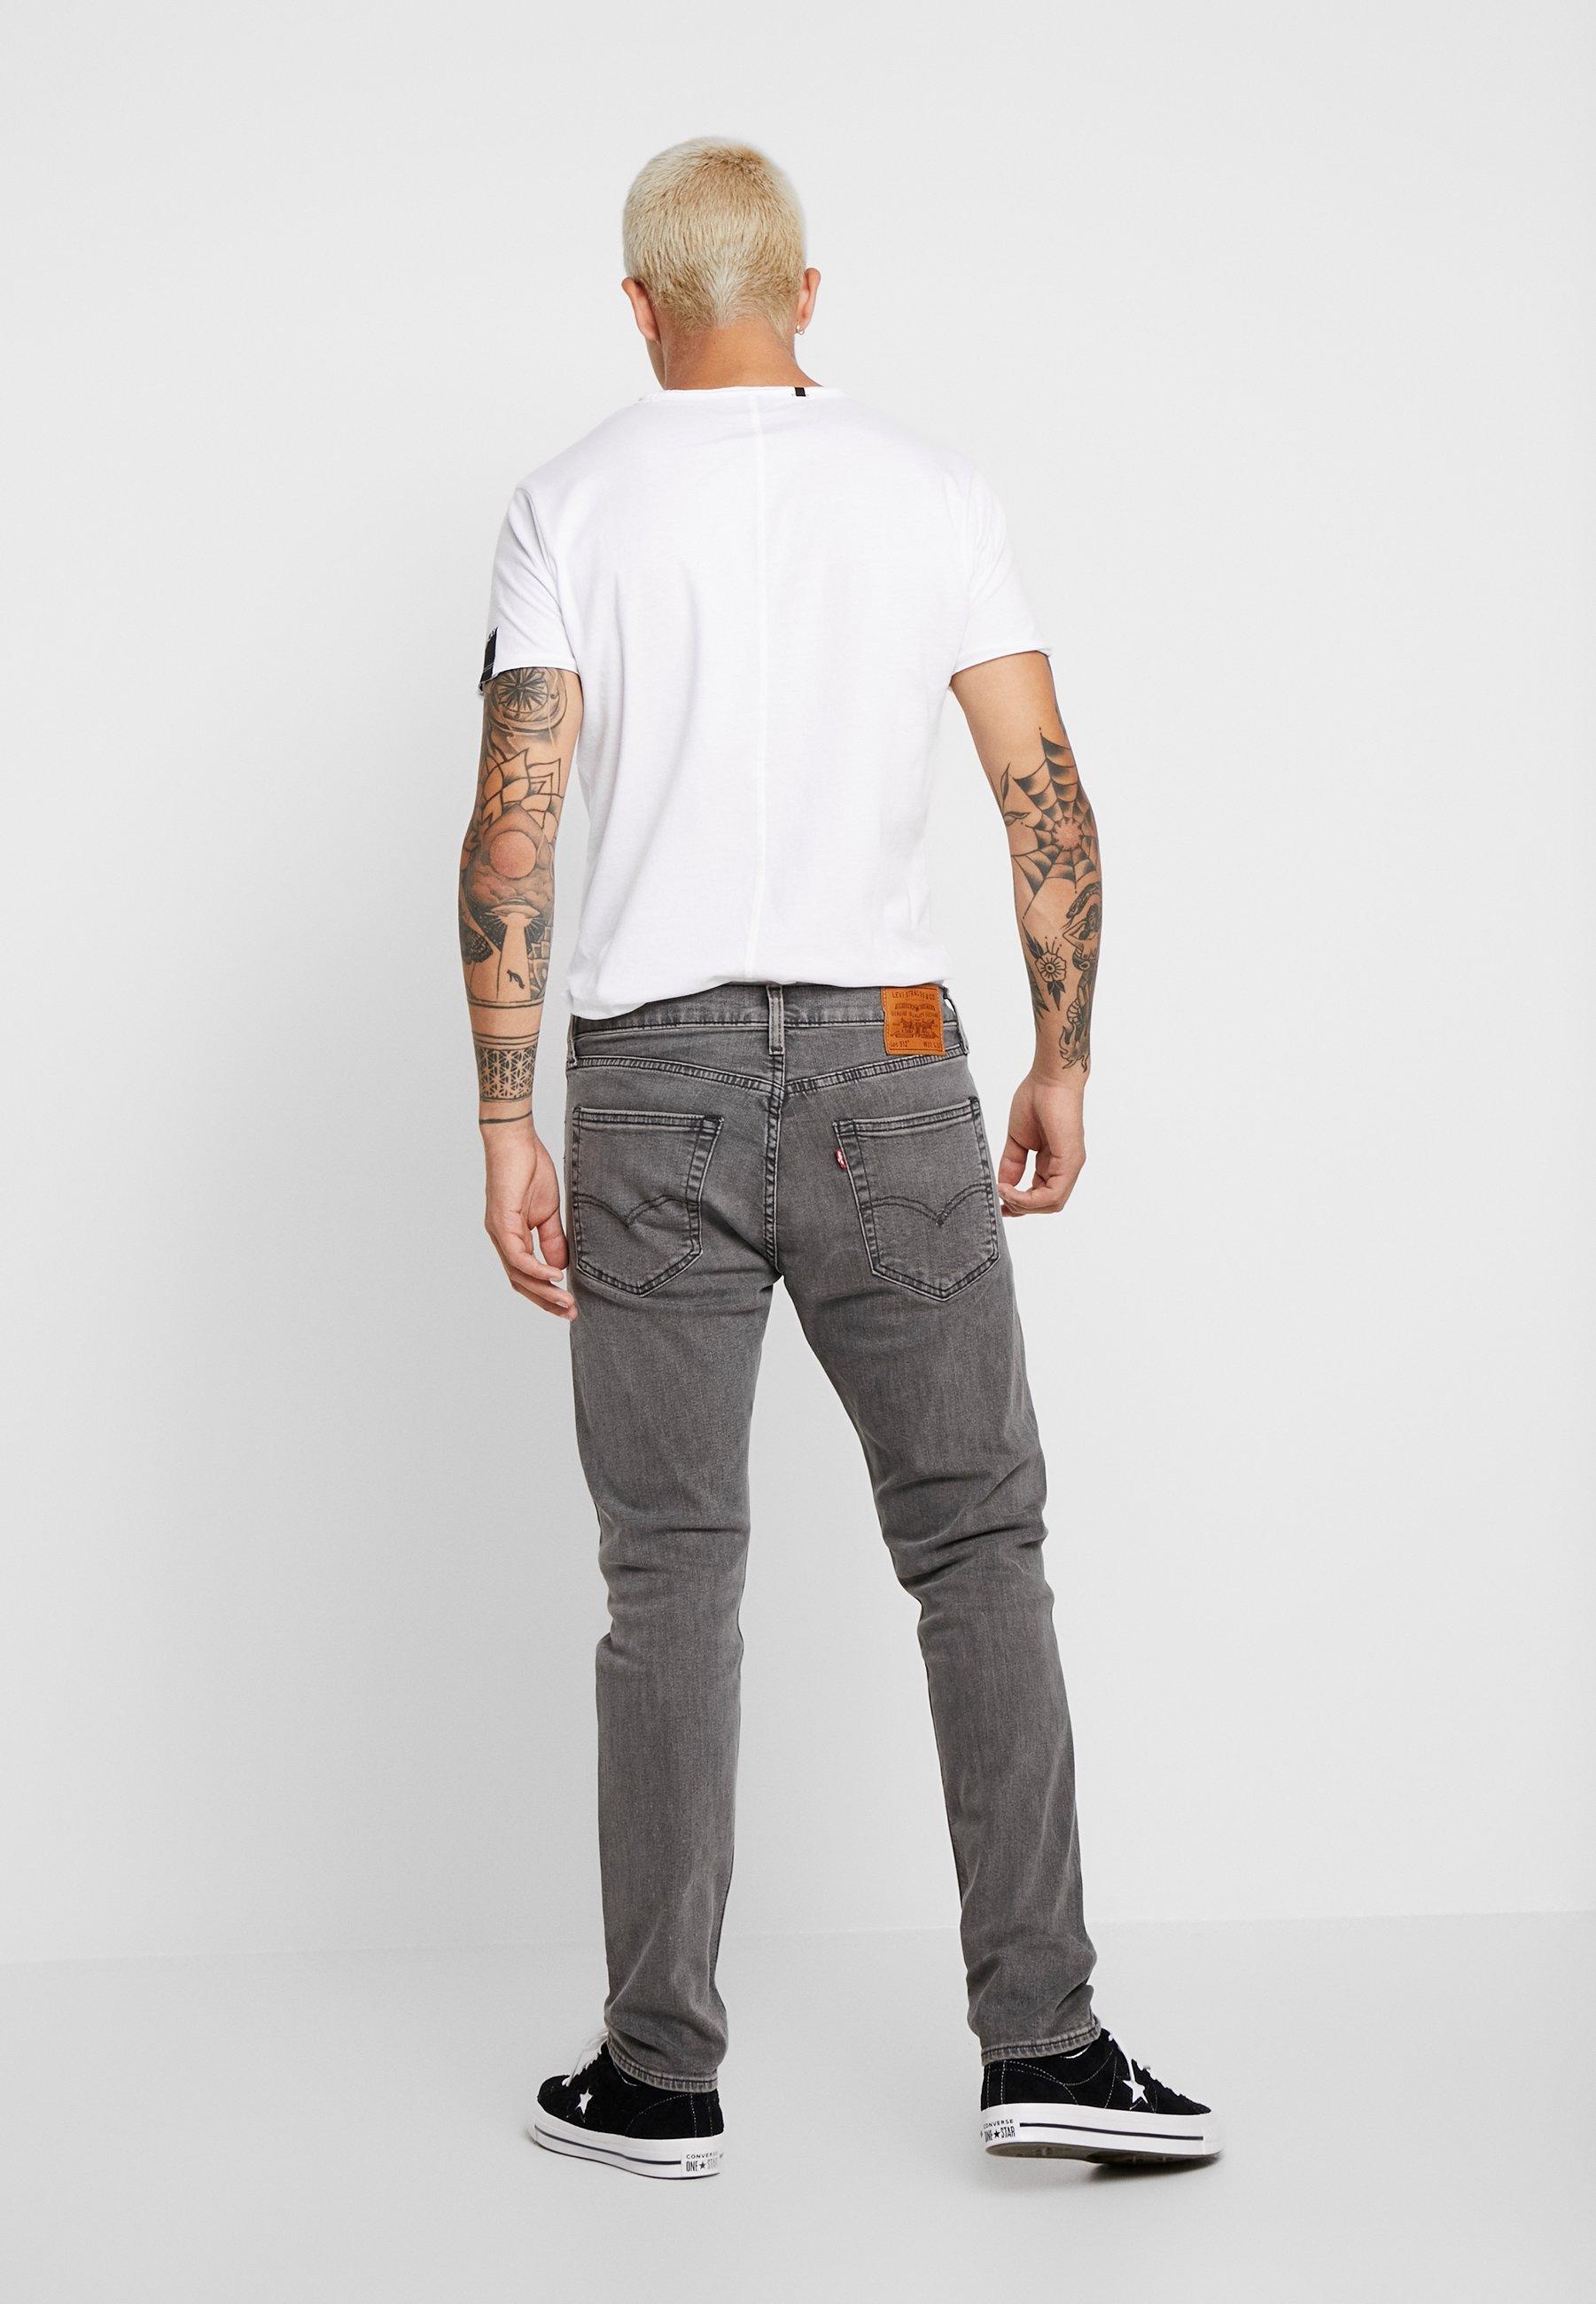 Taper FitJean Levi's® slim Grey Slim 512� Denim b6yIvmYf7g